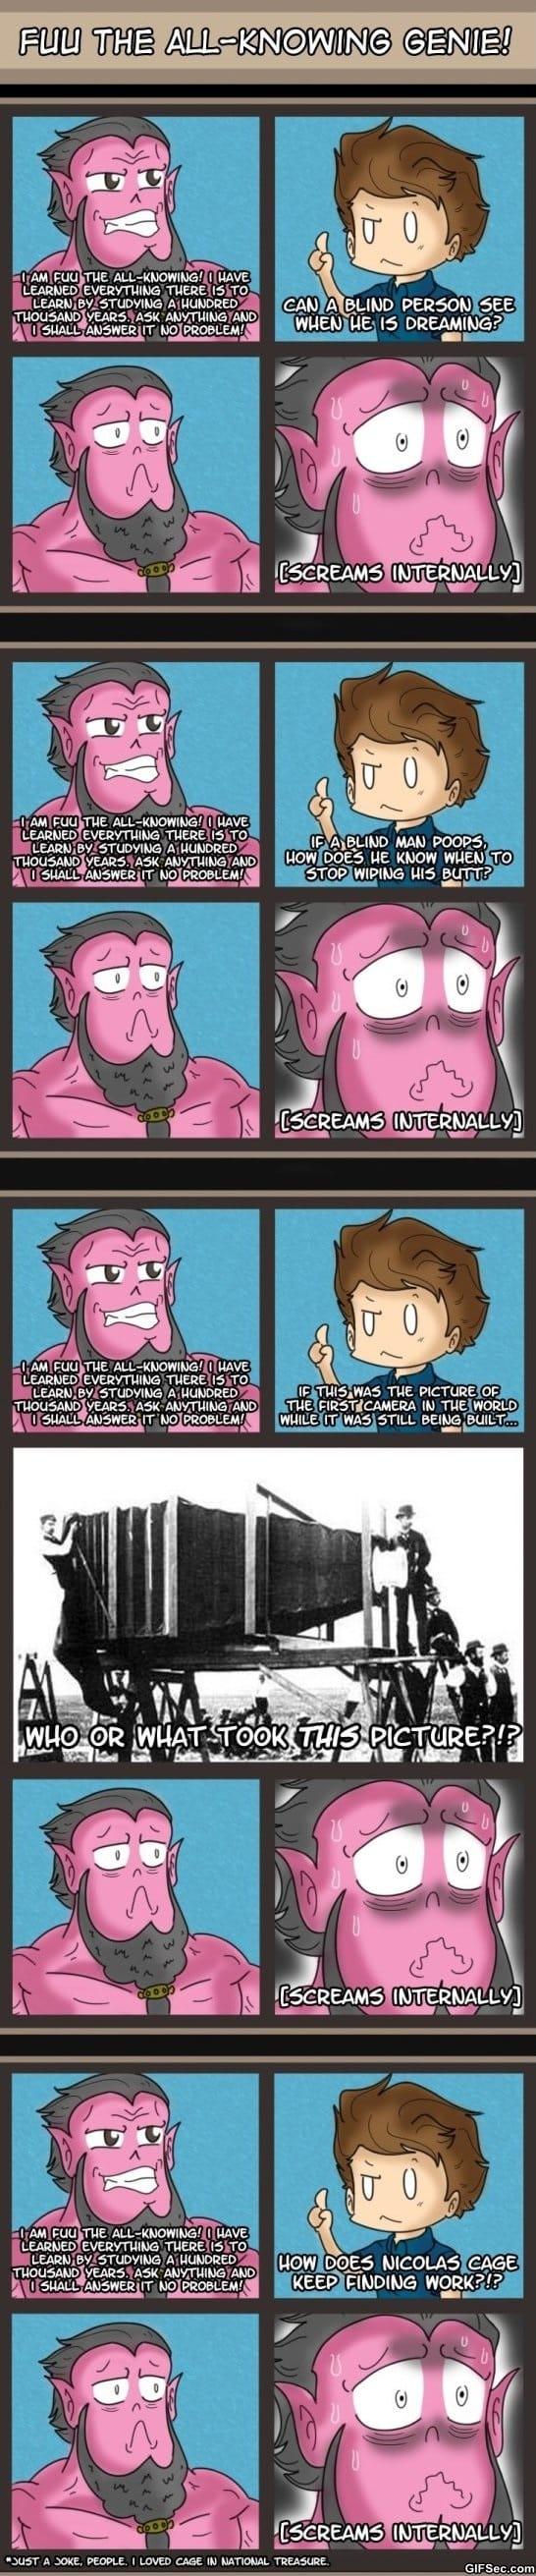 funny-pics-the-genie-meme